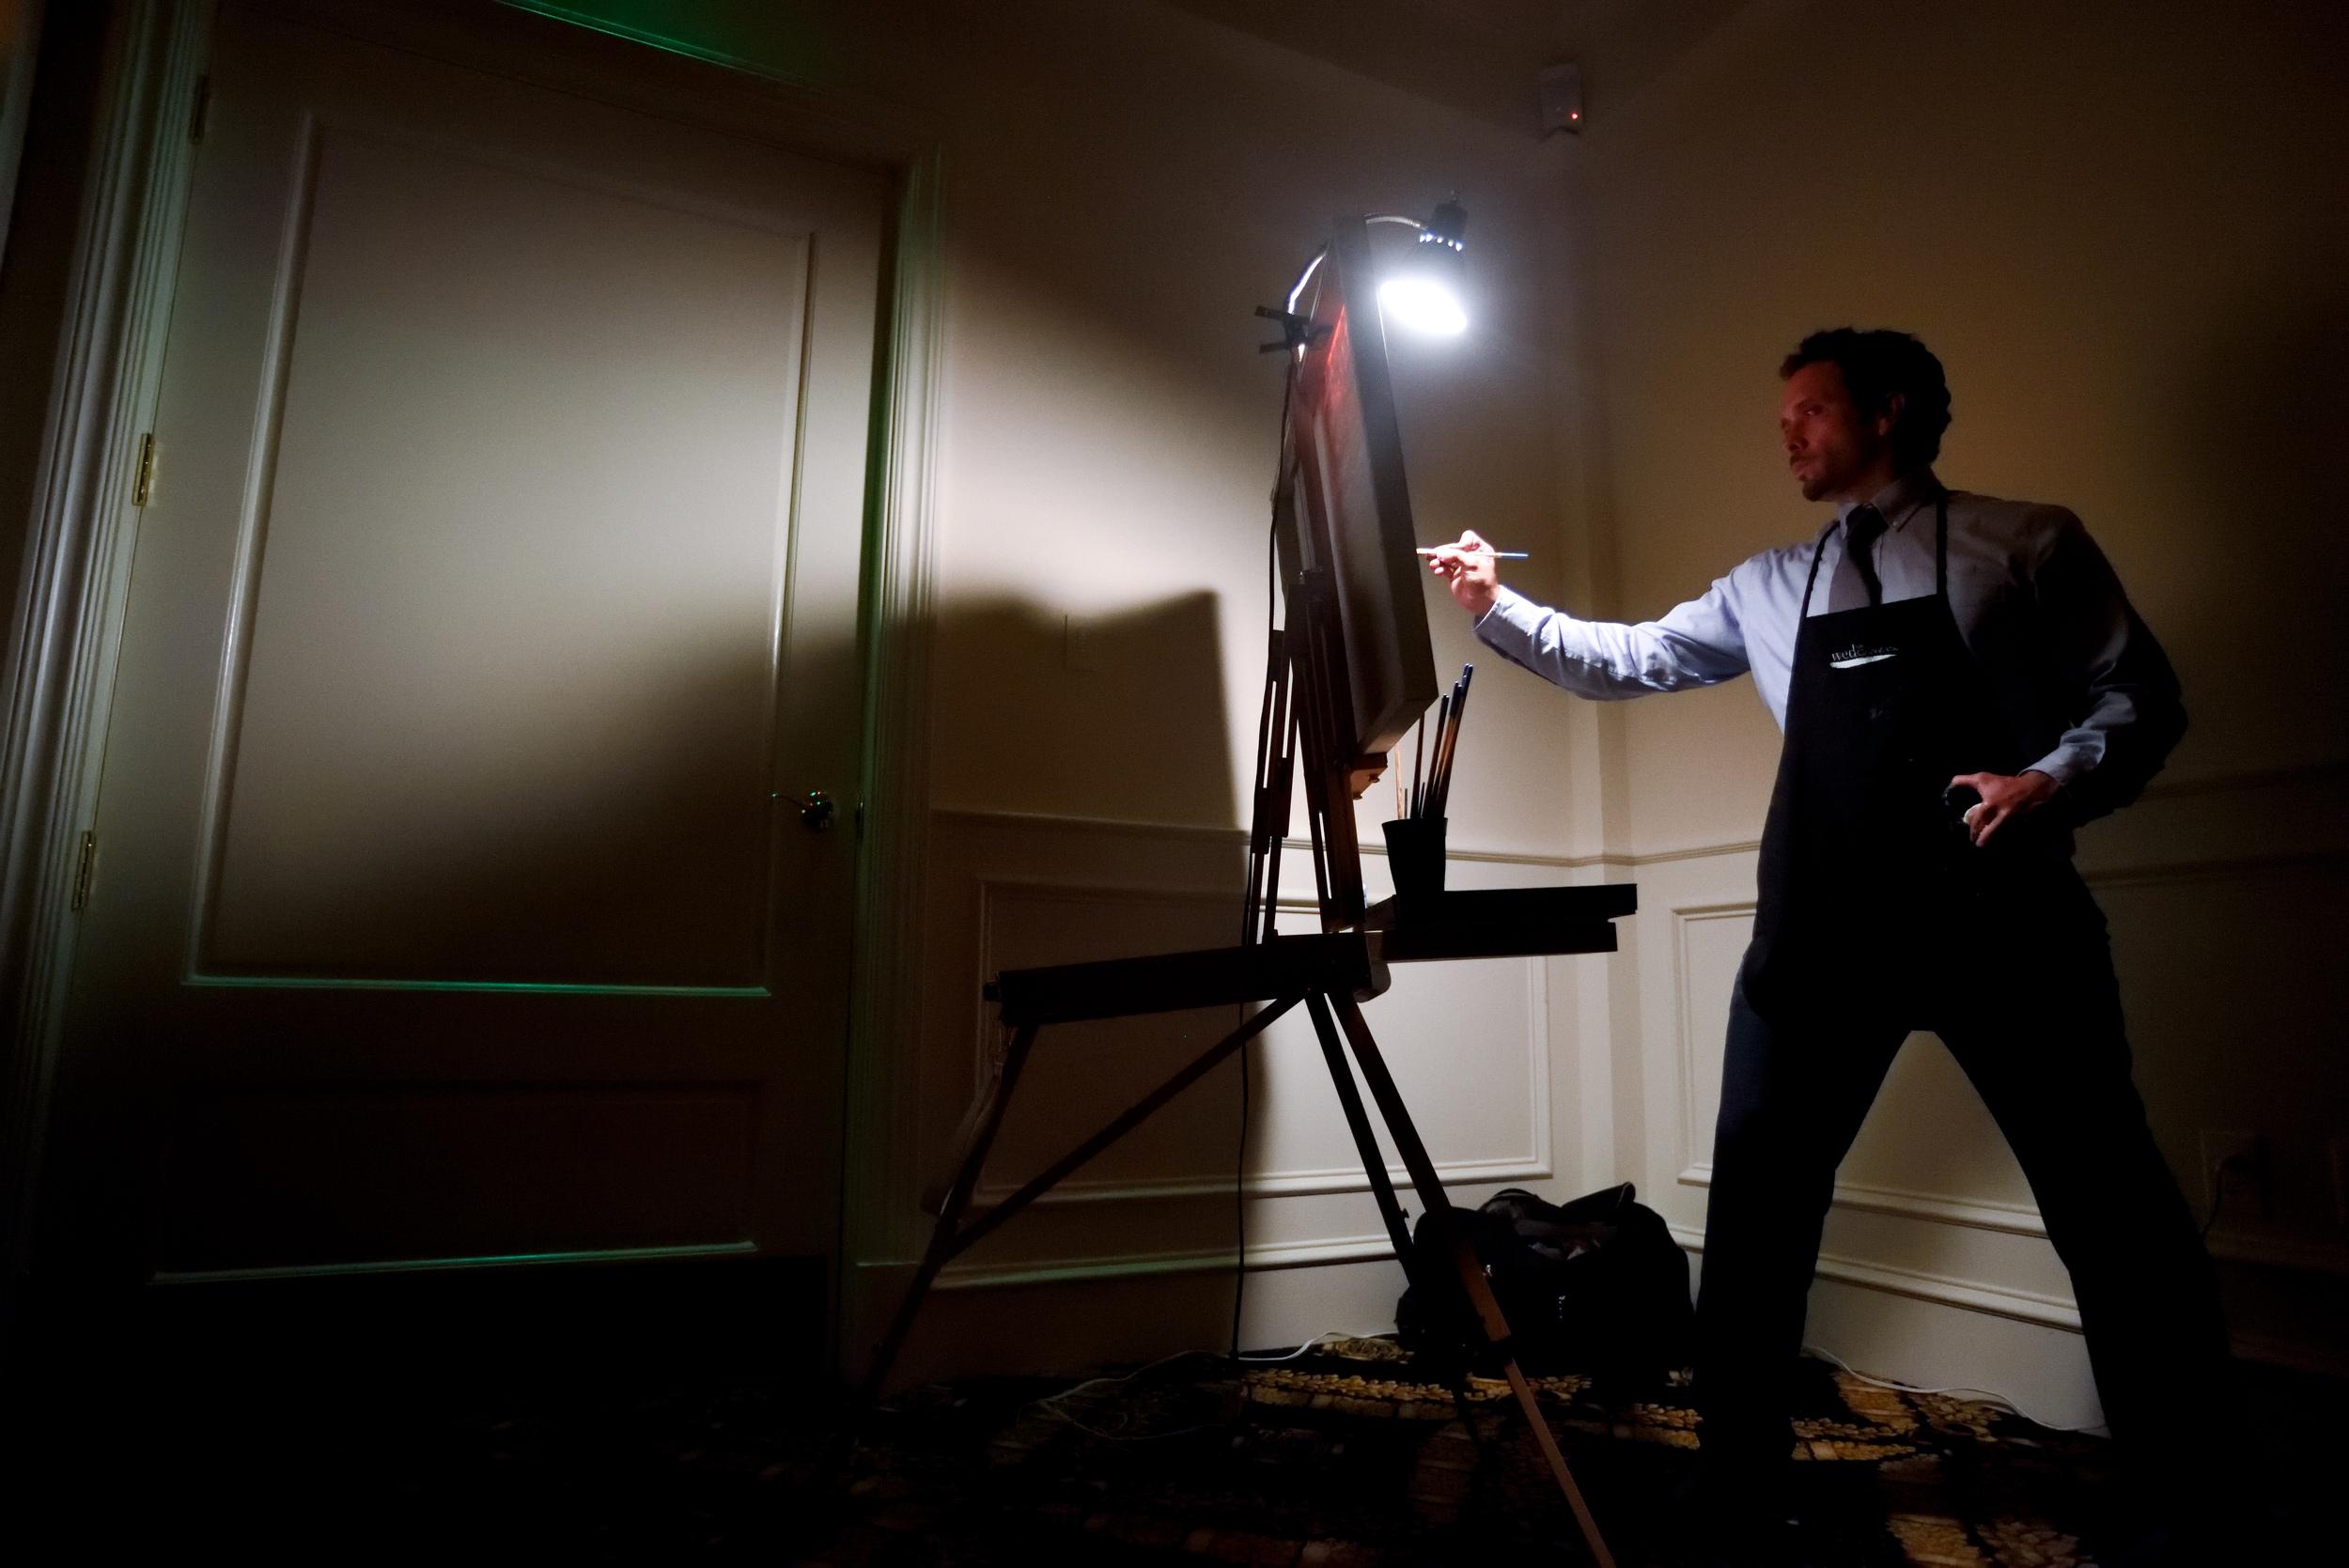 wedding-artist-ben-keys-painting-live-wed-on-canvas-charlotte-trump-national-golf-club-wedding